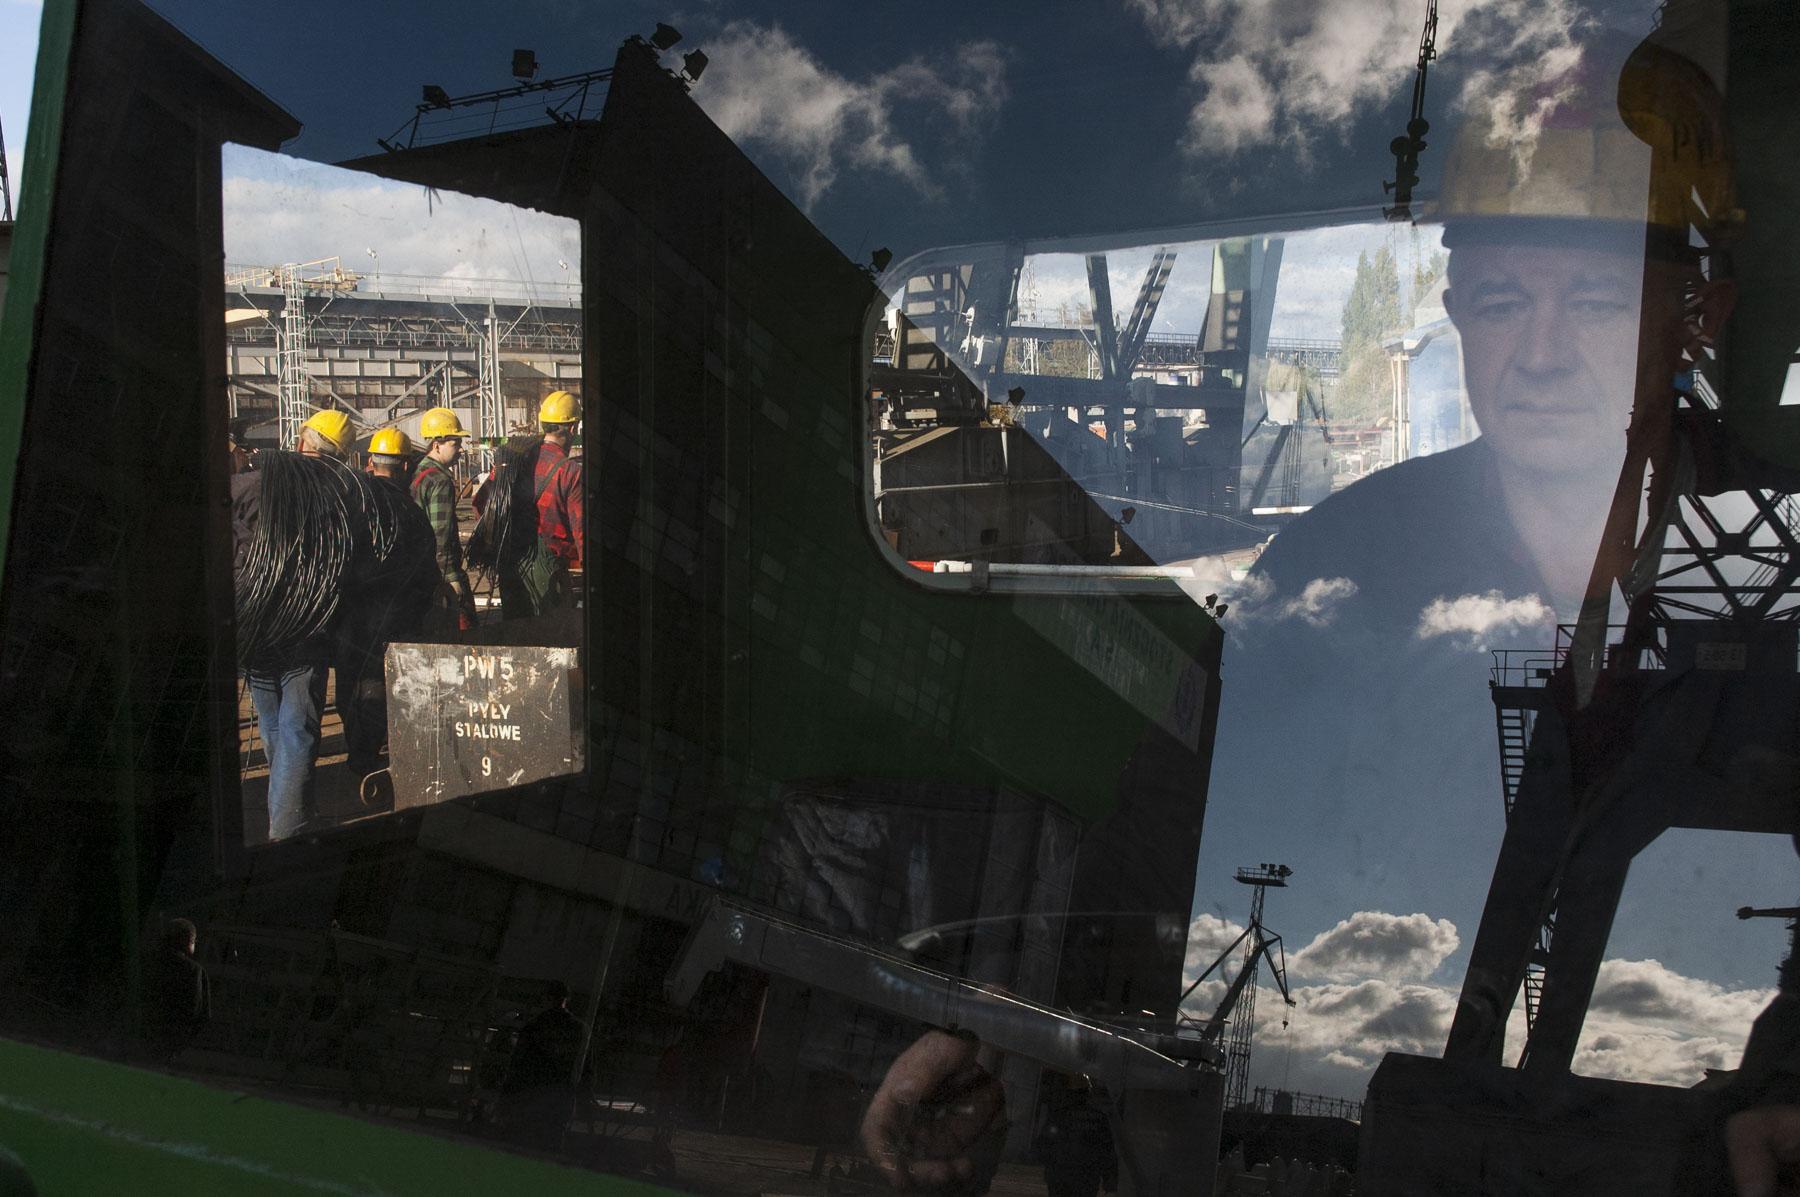 09-Gdansk-Shipyard_09DSC_3934_p-Mikolaj-Nowacki